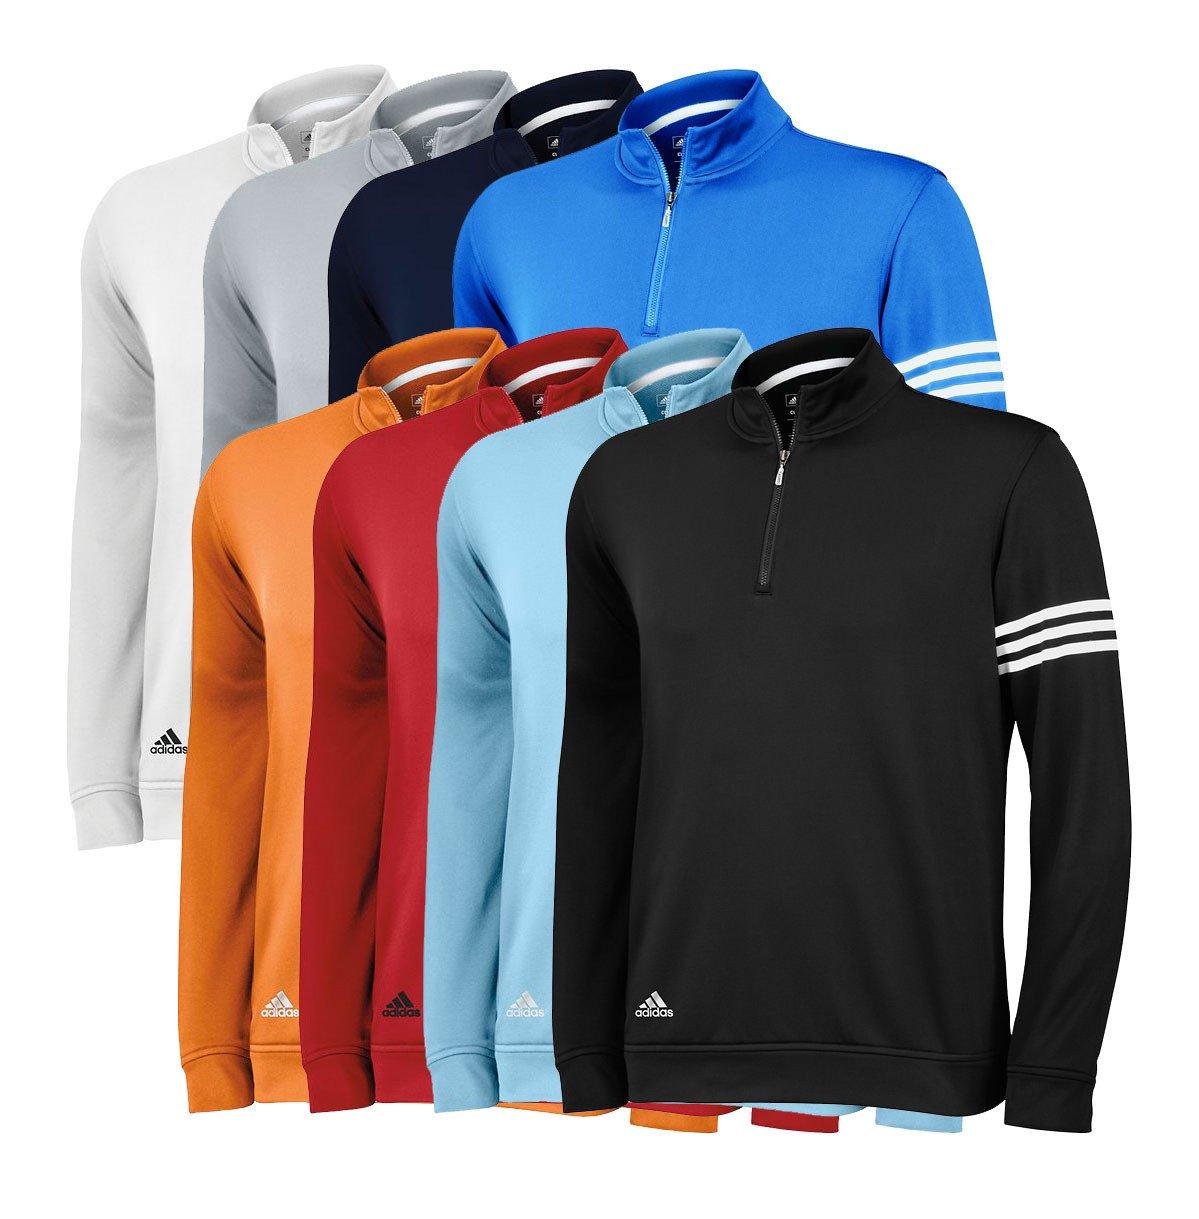 Adidas ClimaLite 3-Stripes Pullover 2013 - Adidas Golf